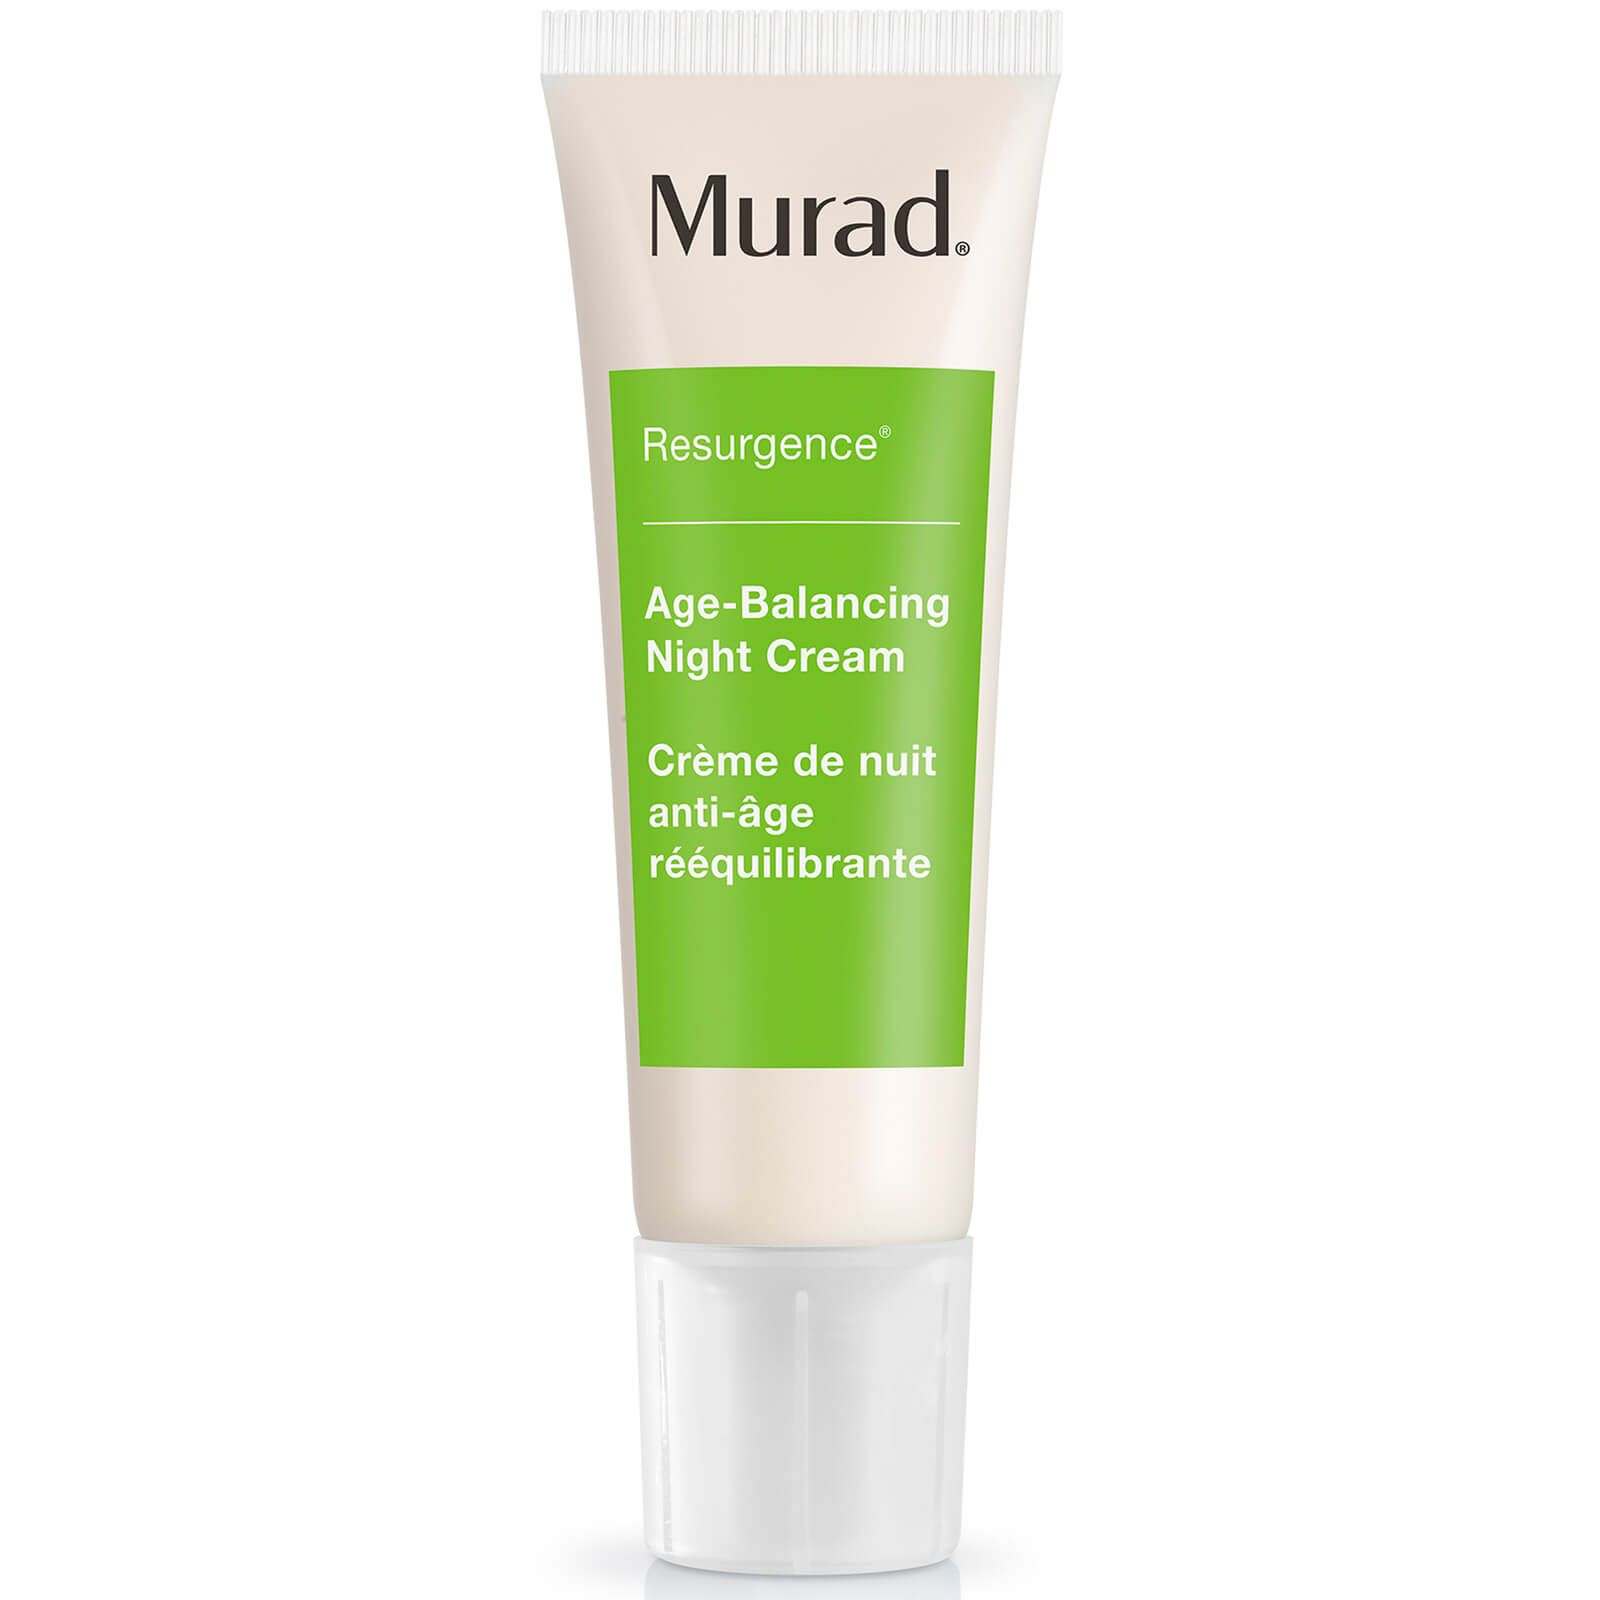 Murad night cream